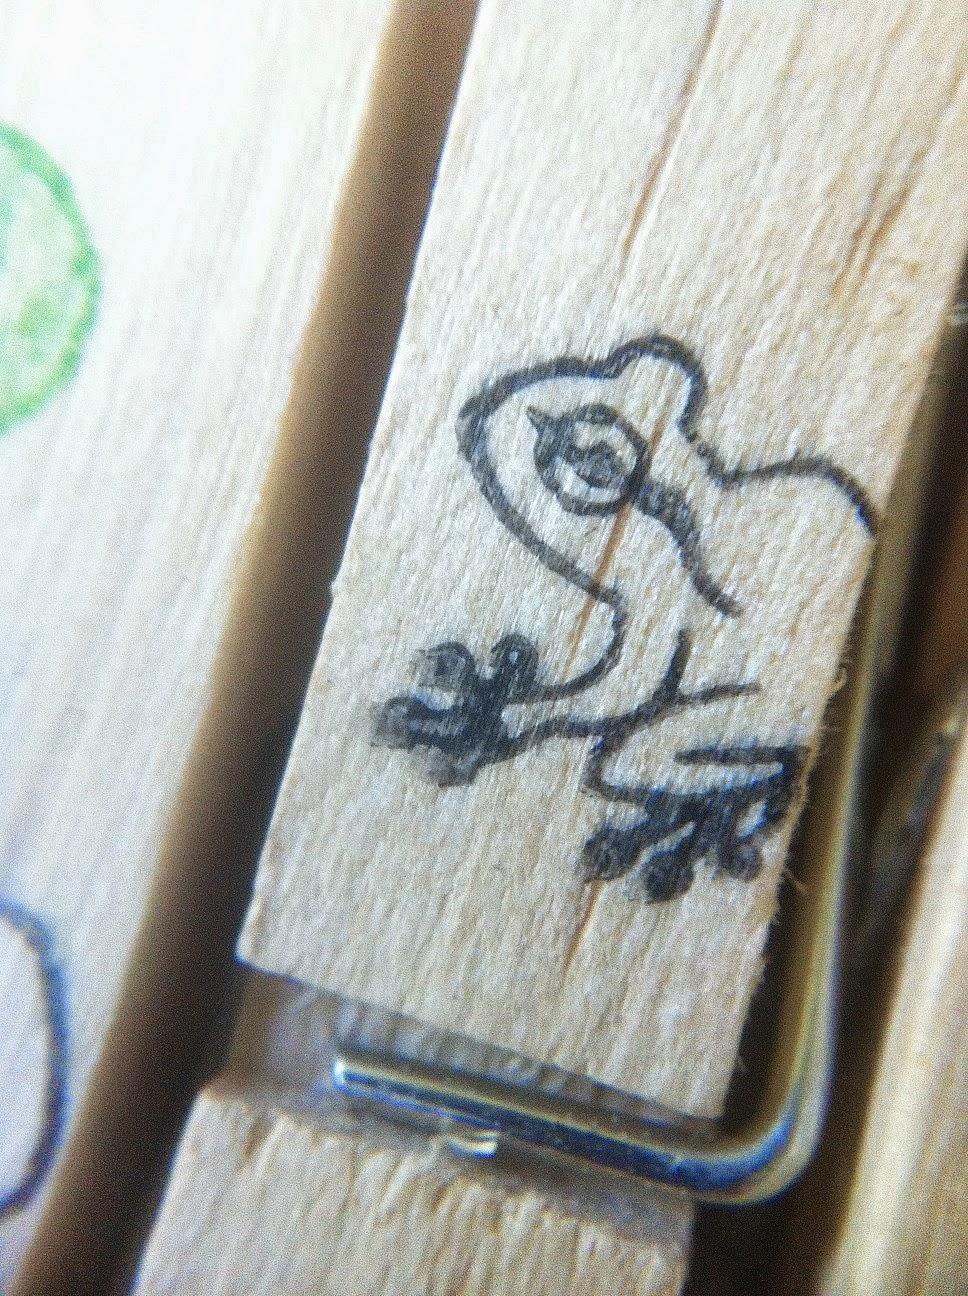 Upcycling - Tuesday Kindergeburtstags-Vorbereitungen Makro Frosch